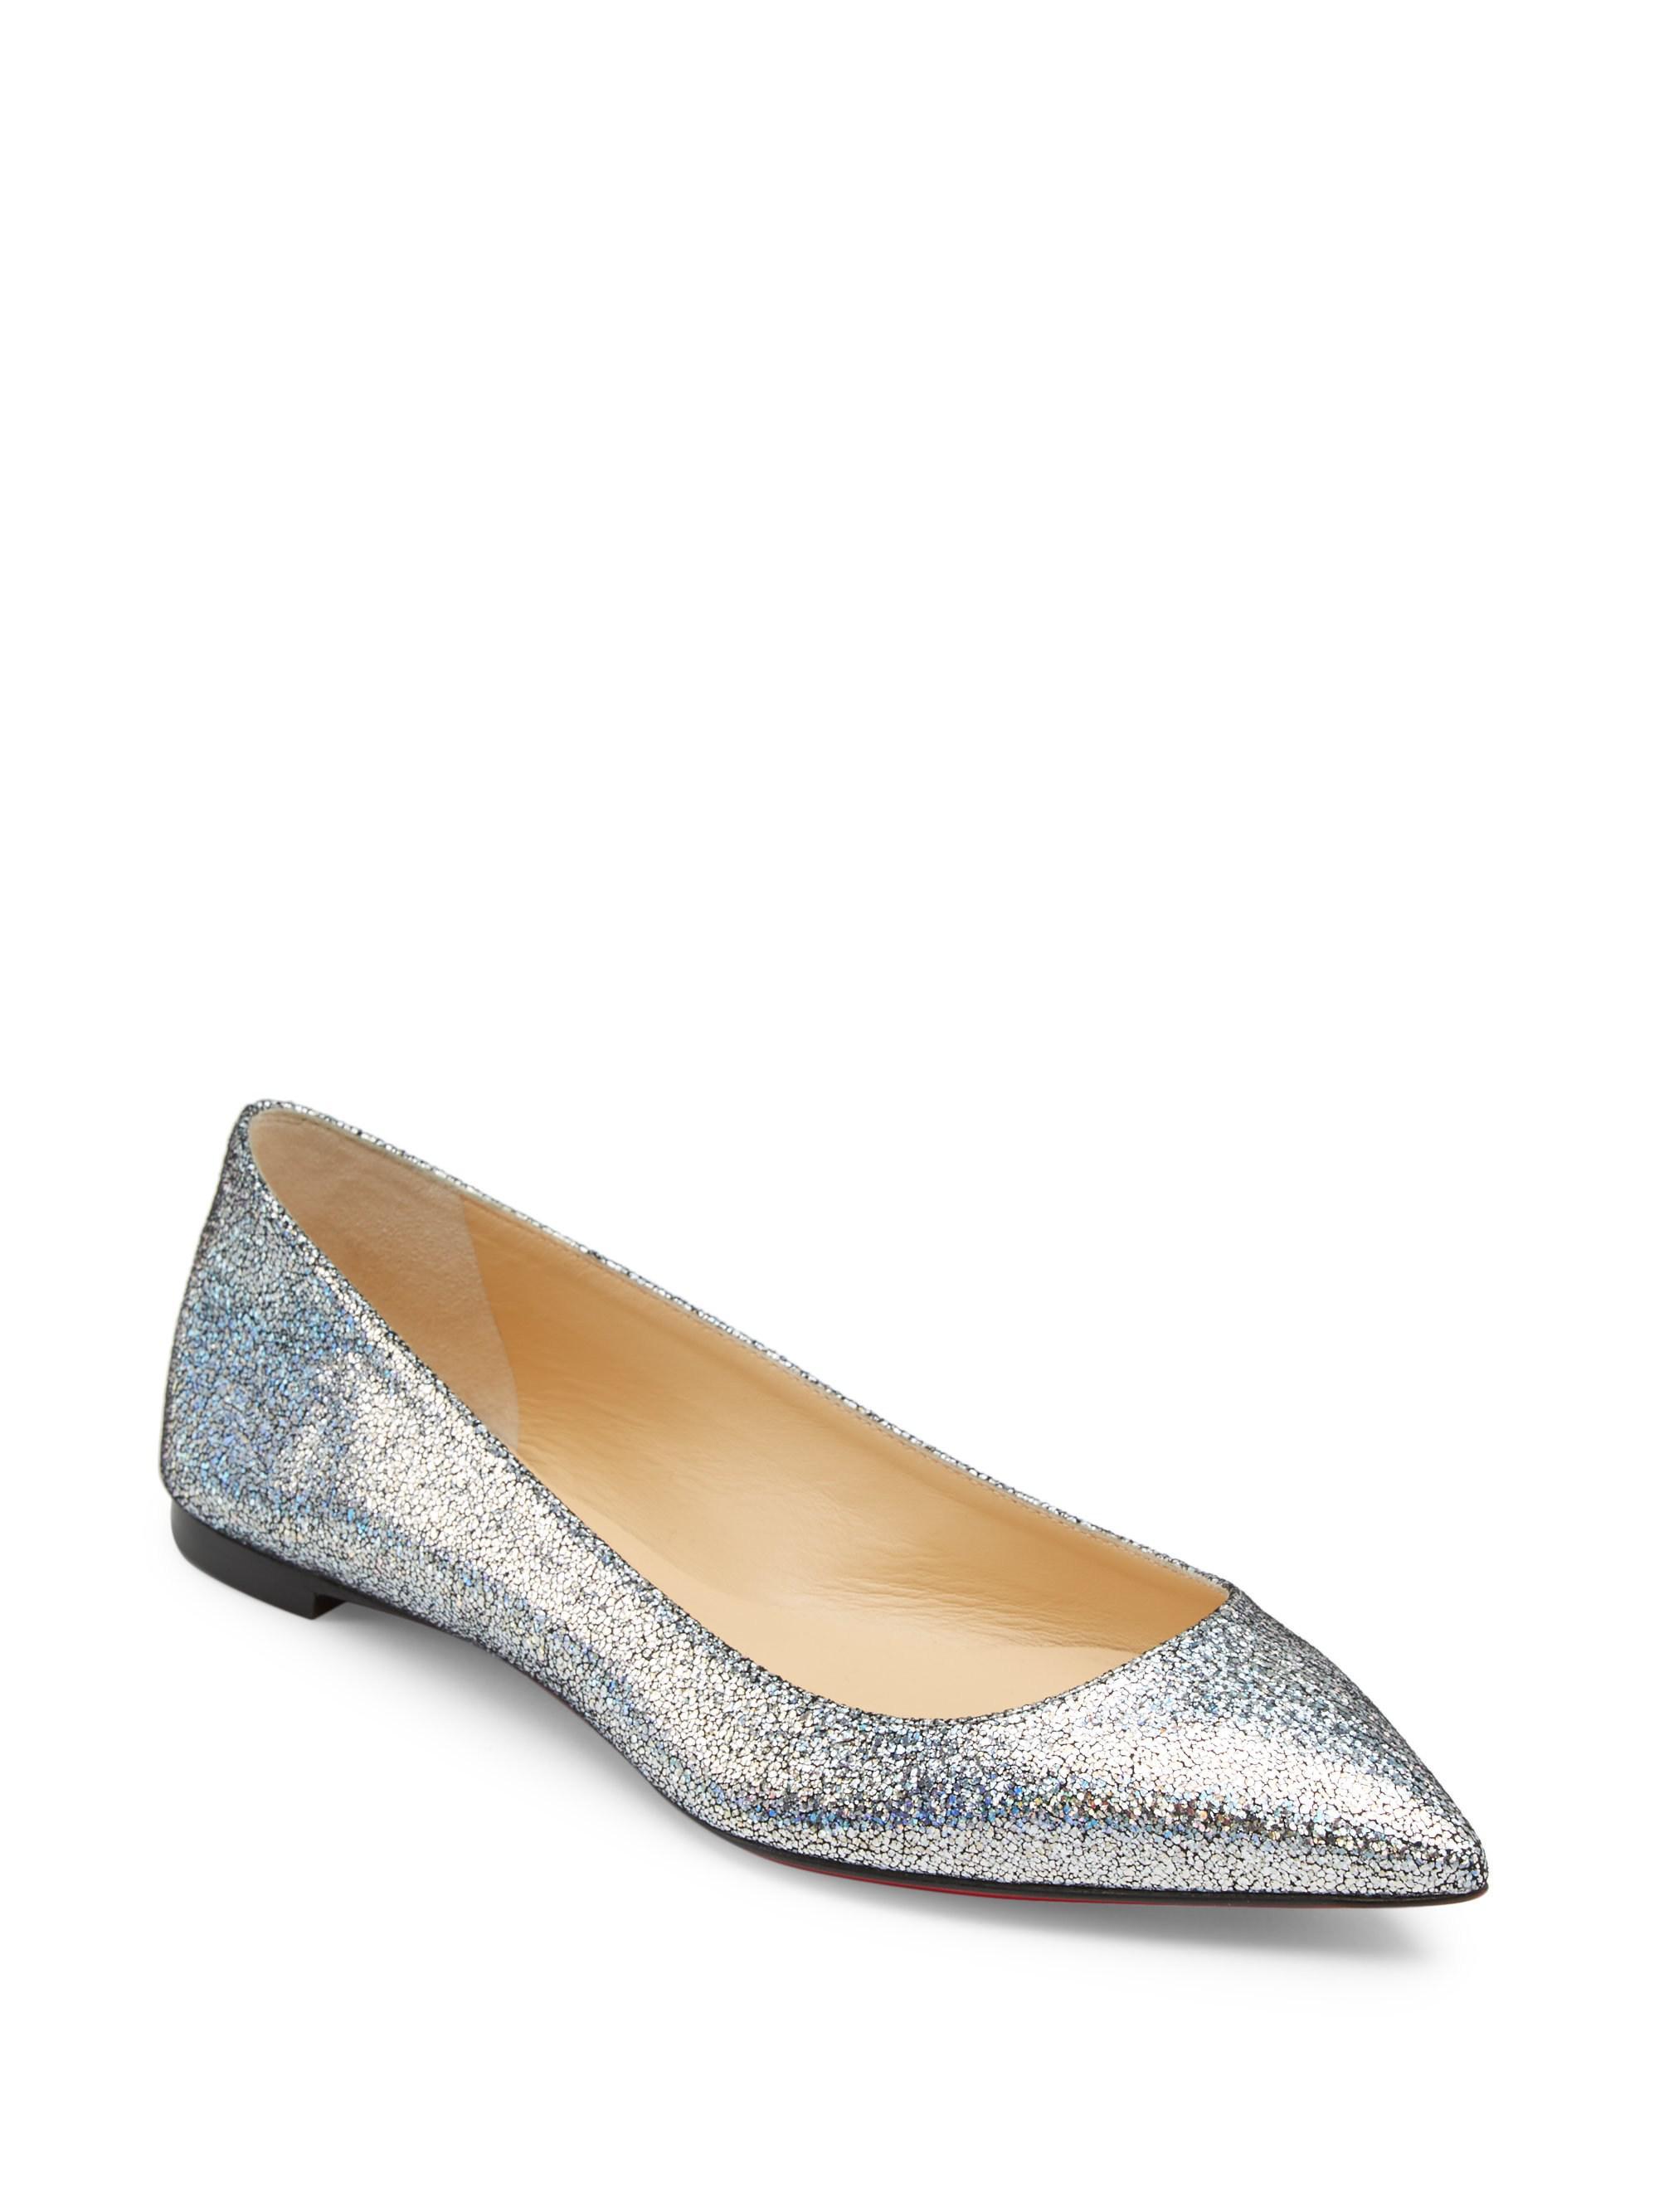 c90424706e74 Christian Louboutin Ballalla Glitter Suede Flats in Metallic - Save ...